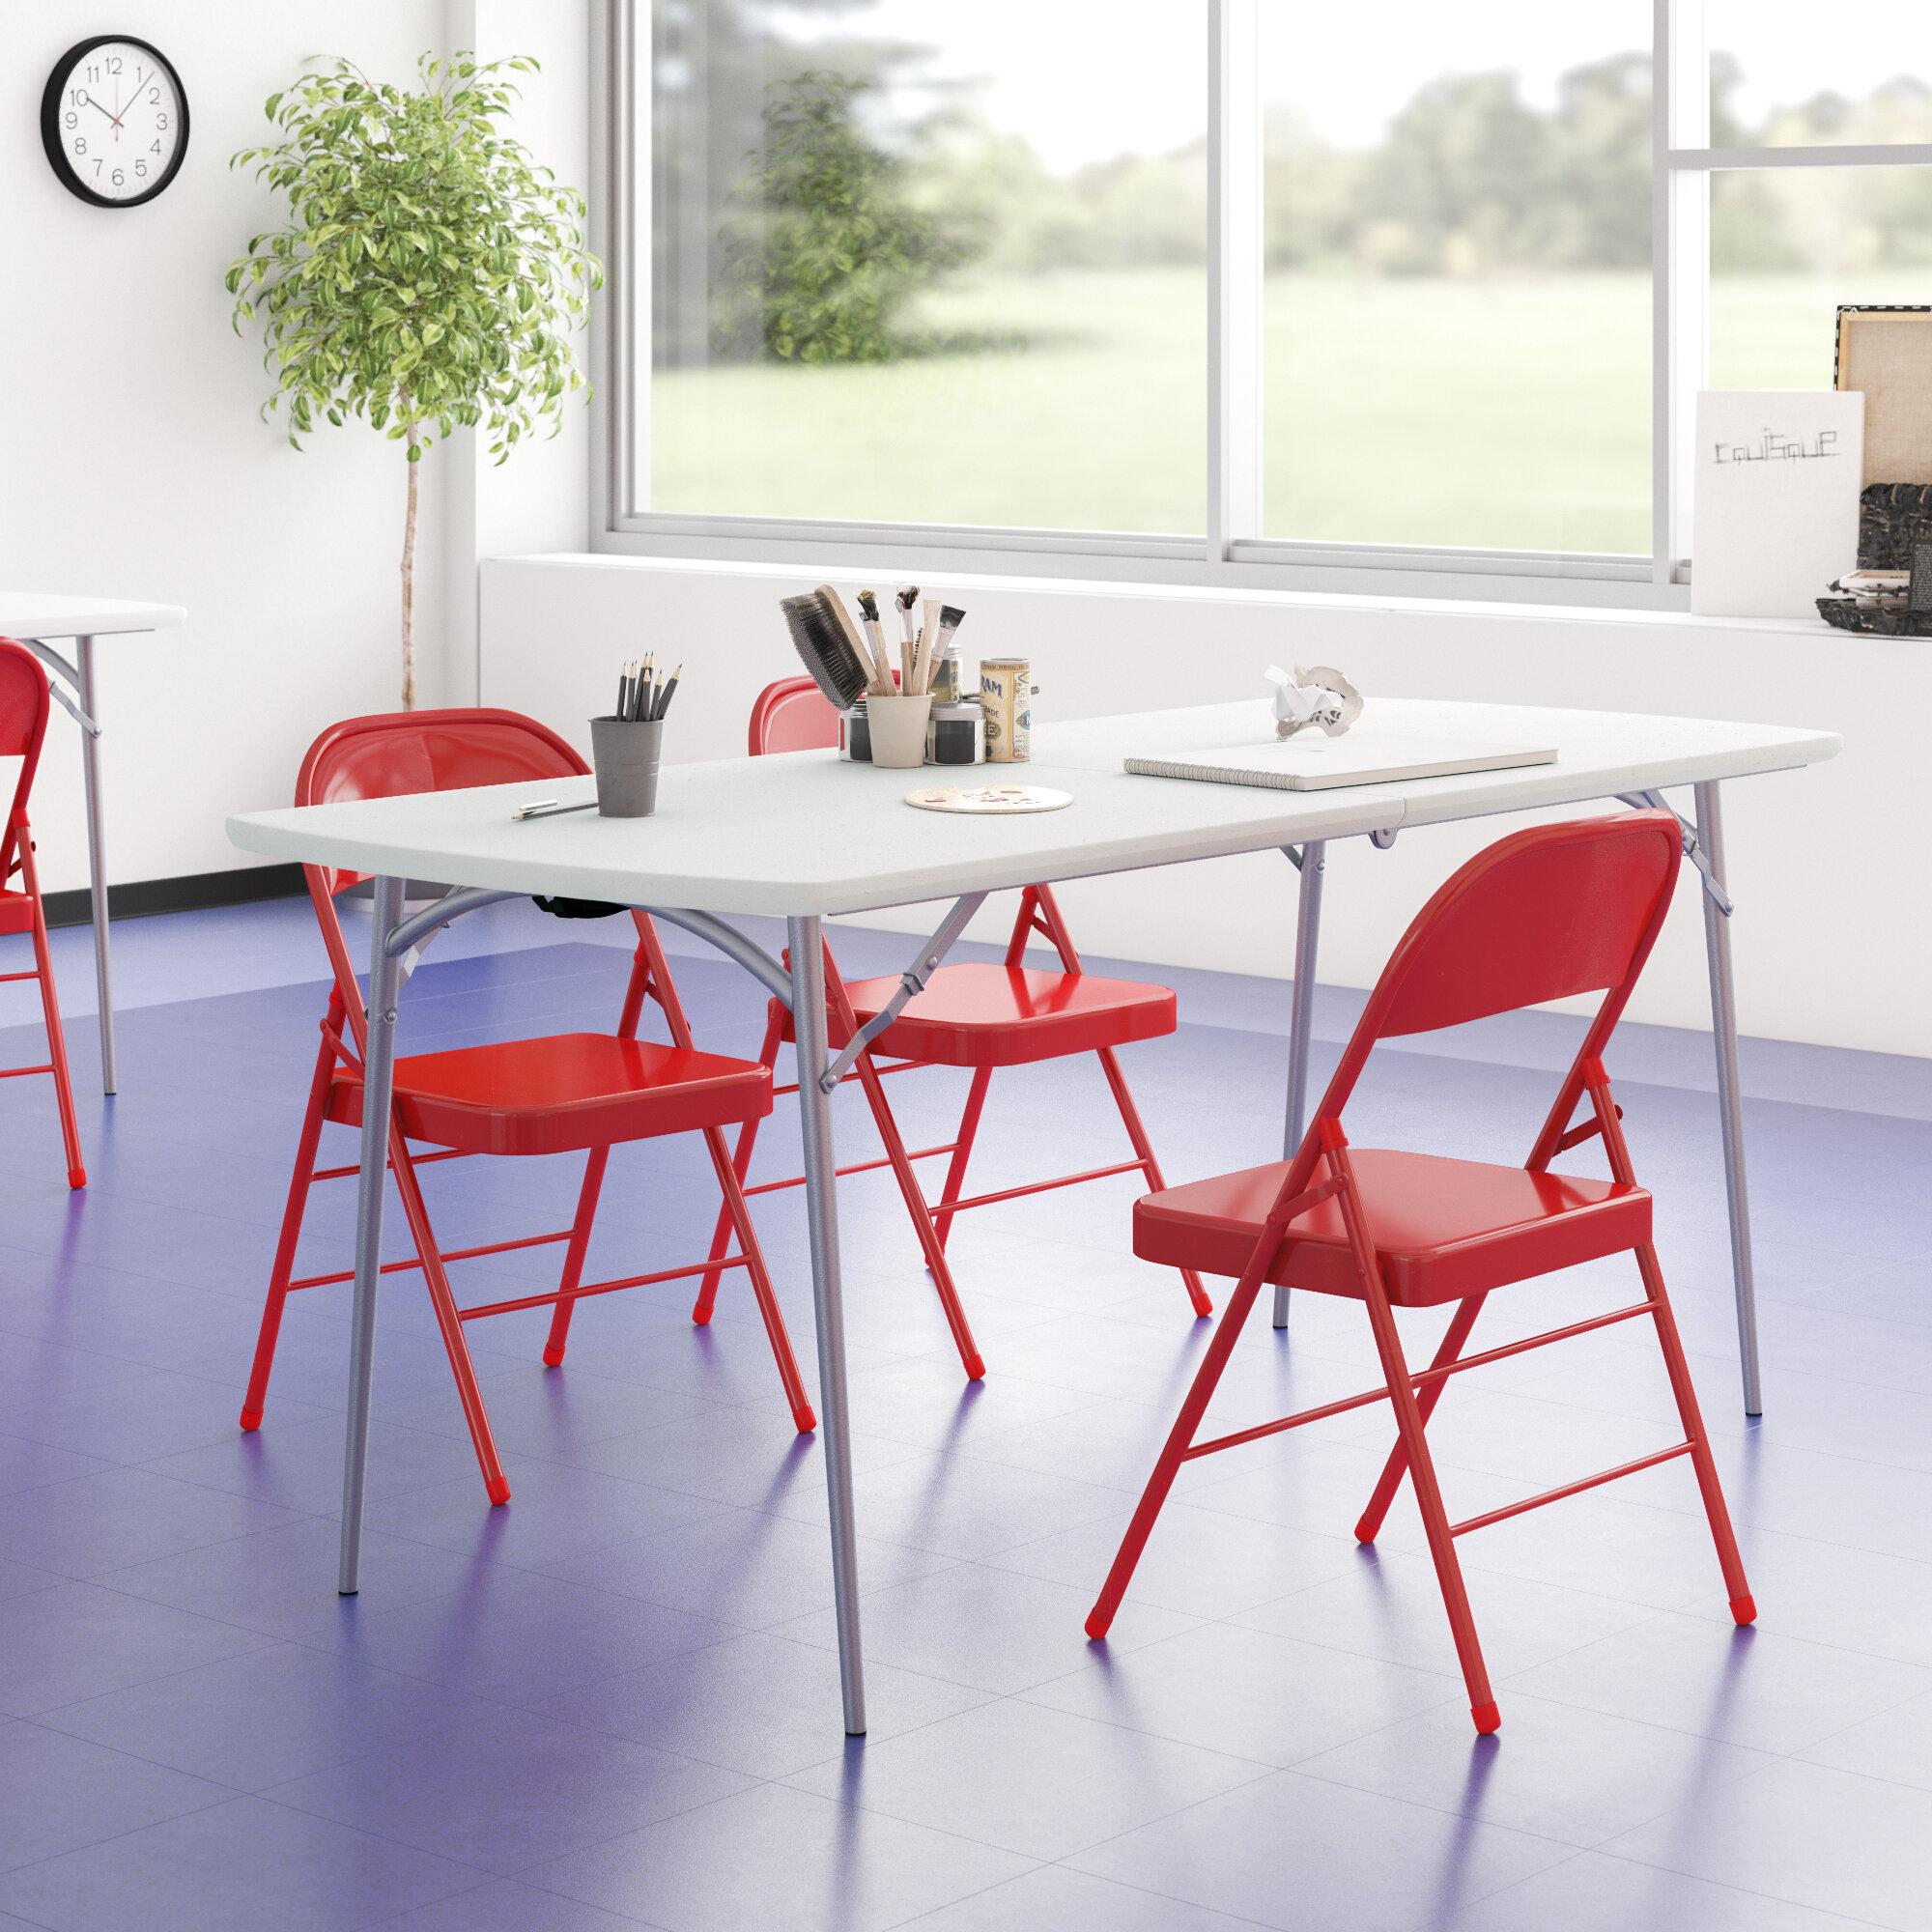 National Public Seating 71 8 Plastic Rectangular Portable Folding Table Reviews Wayfair